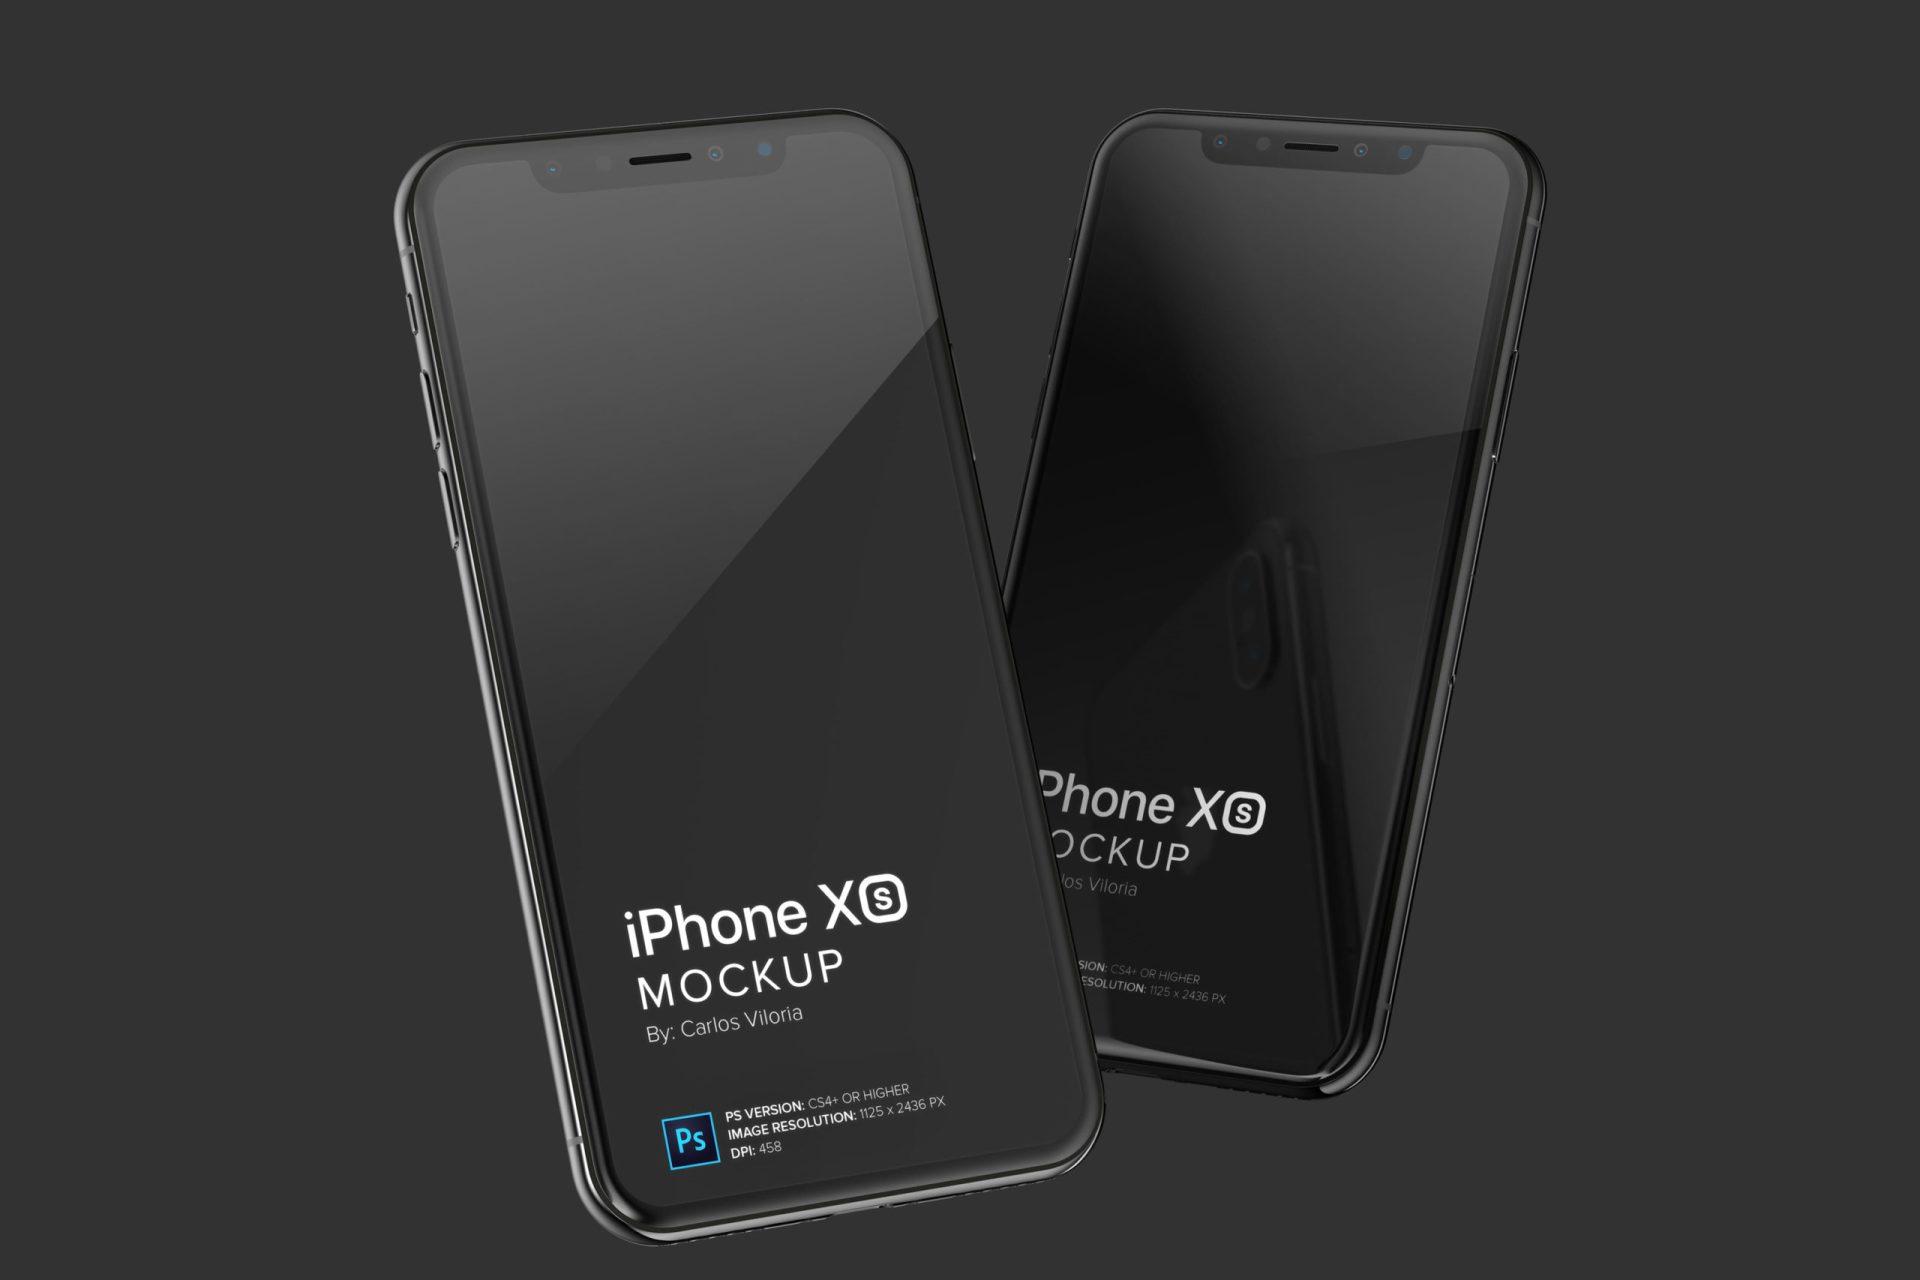 iPhone XS Mockup for Responsive Web Design